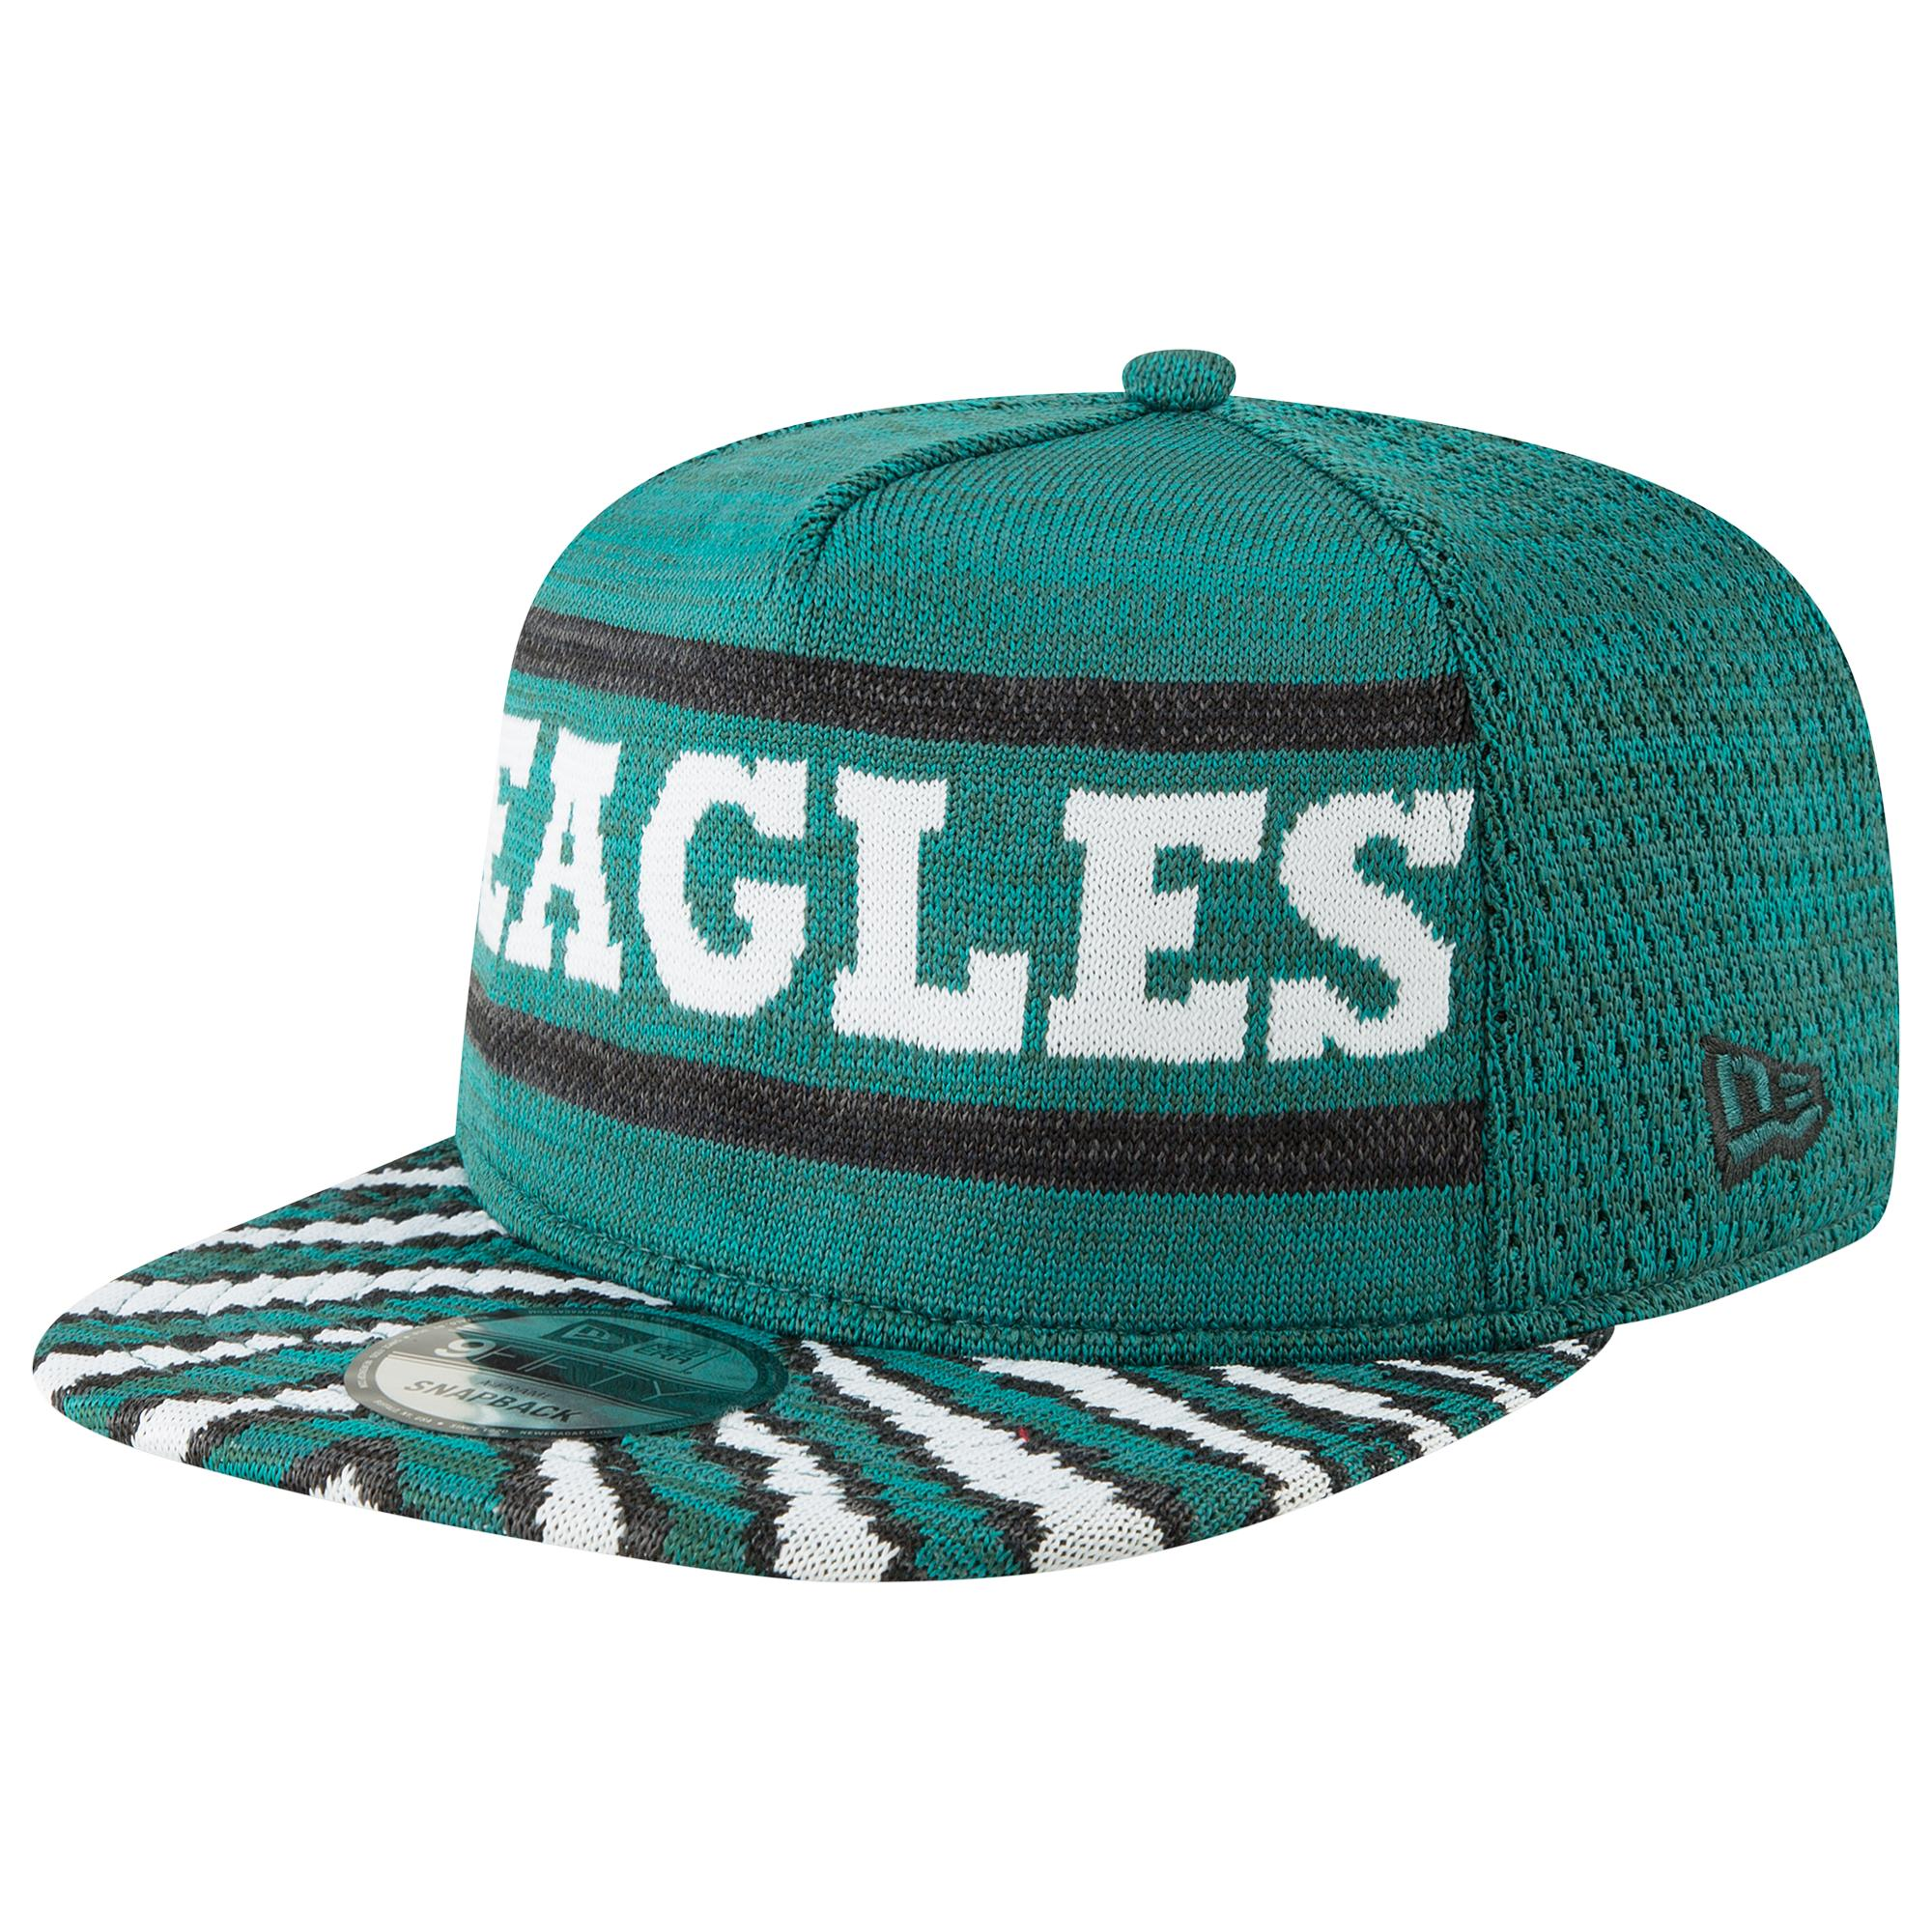 961c778c KTZ. Men's Green Philadelphia Eagles Nfl 9fifty Fresh Front Zubaz Snapback